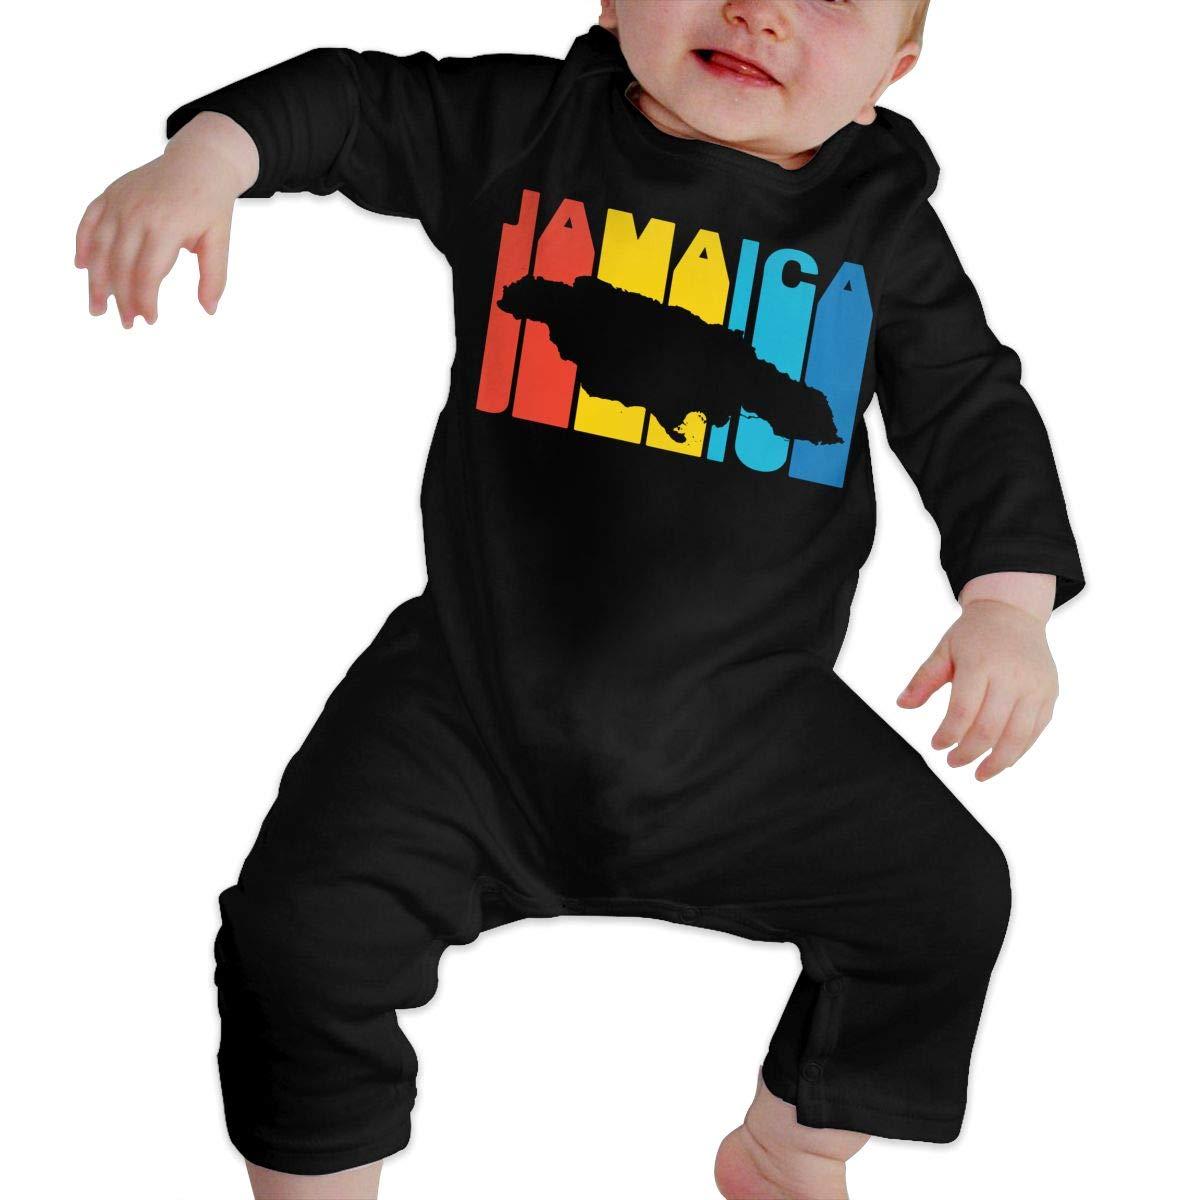 LBJQ8 Jamaica Retro 1970s Style Newborn Toddler Baby Organic Cotton Romper Jumpsuit Bodysuit